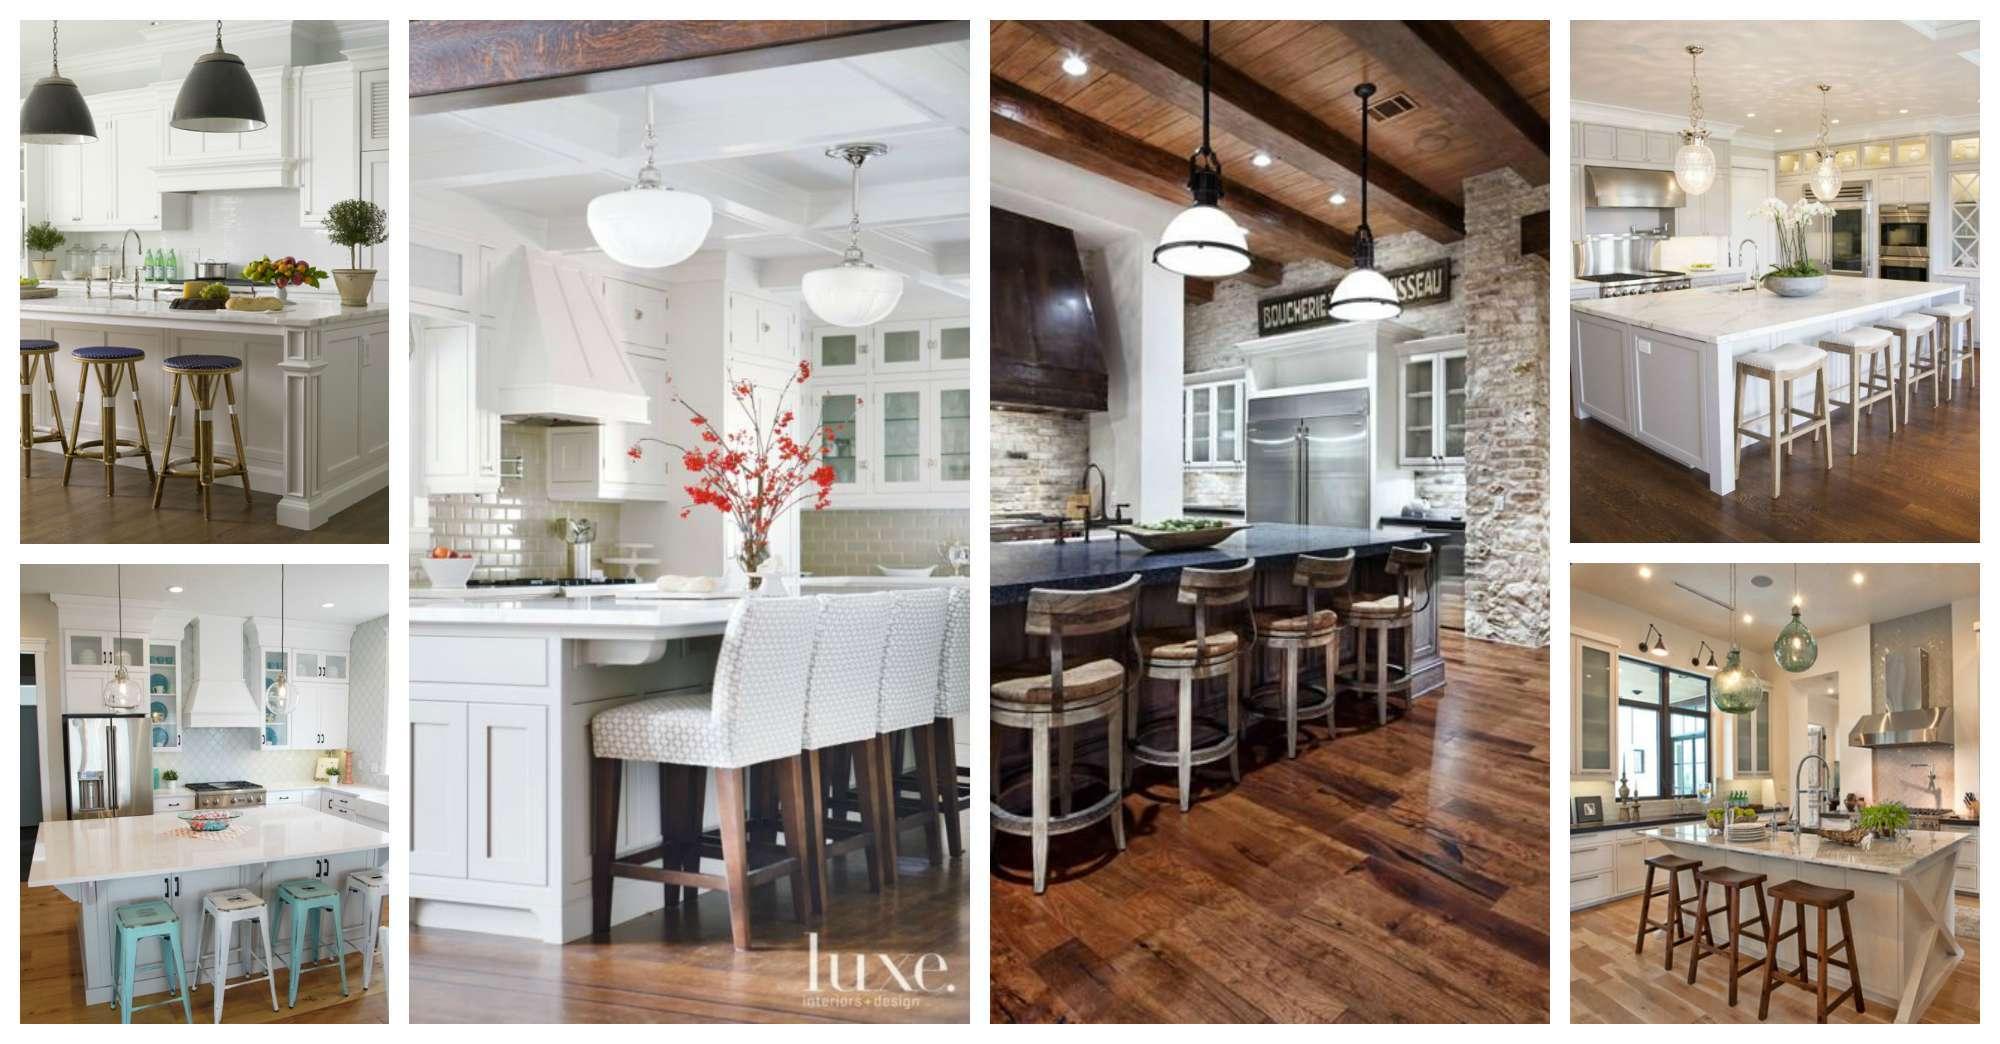 Amazing Kitchen Design Ideas with Bar Stools